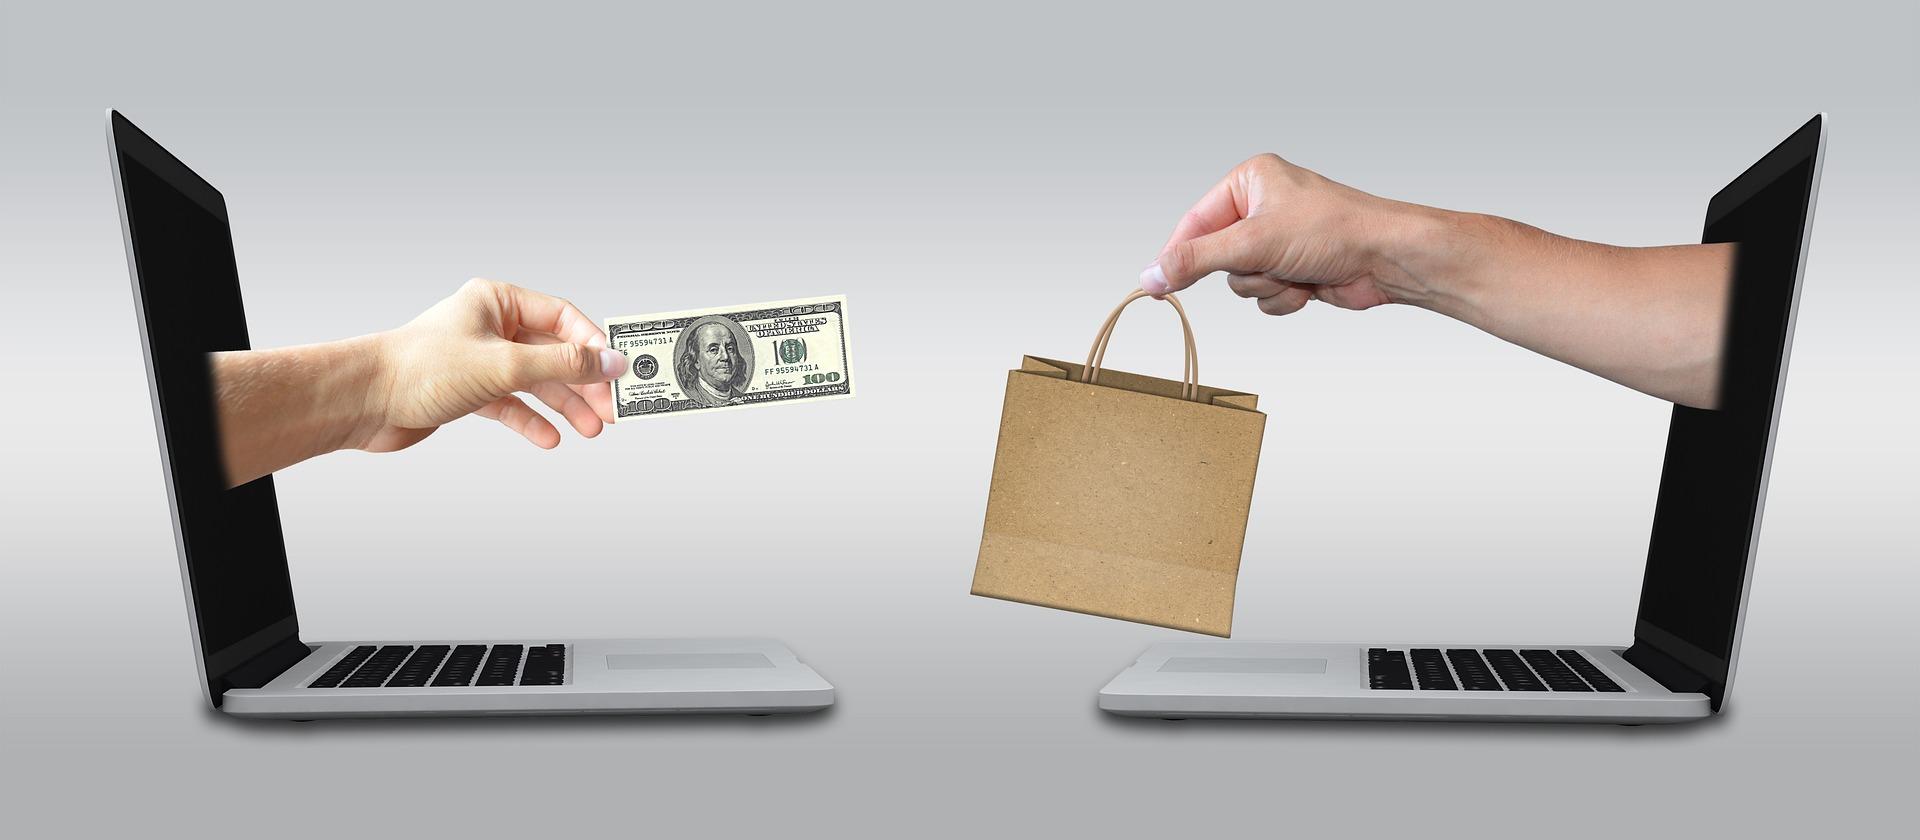 New website promotes e-commerce